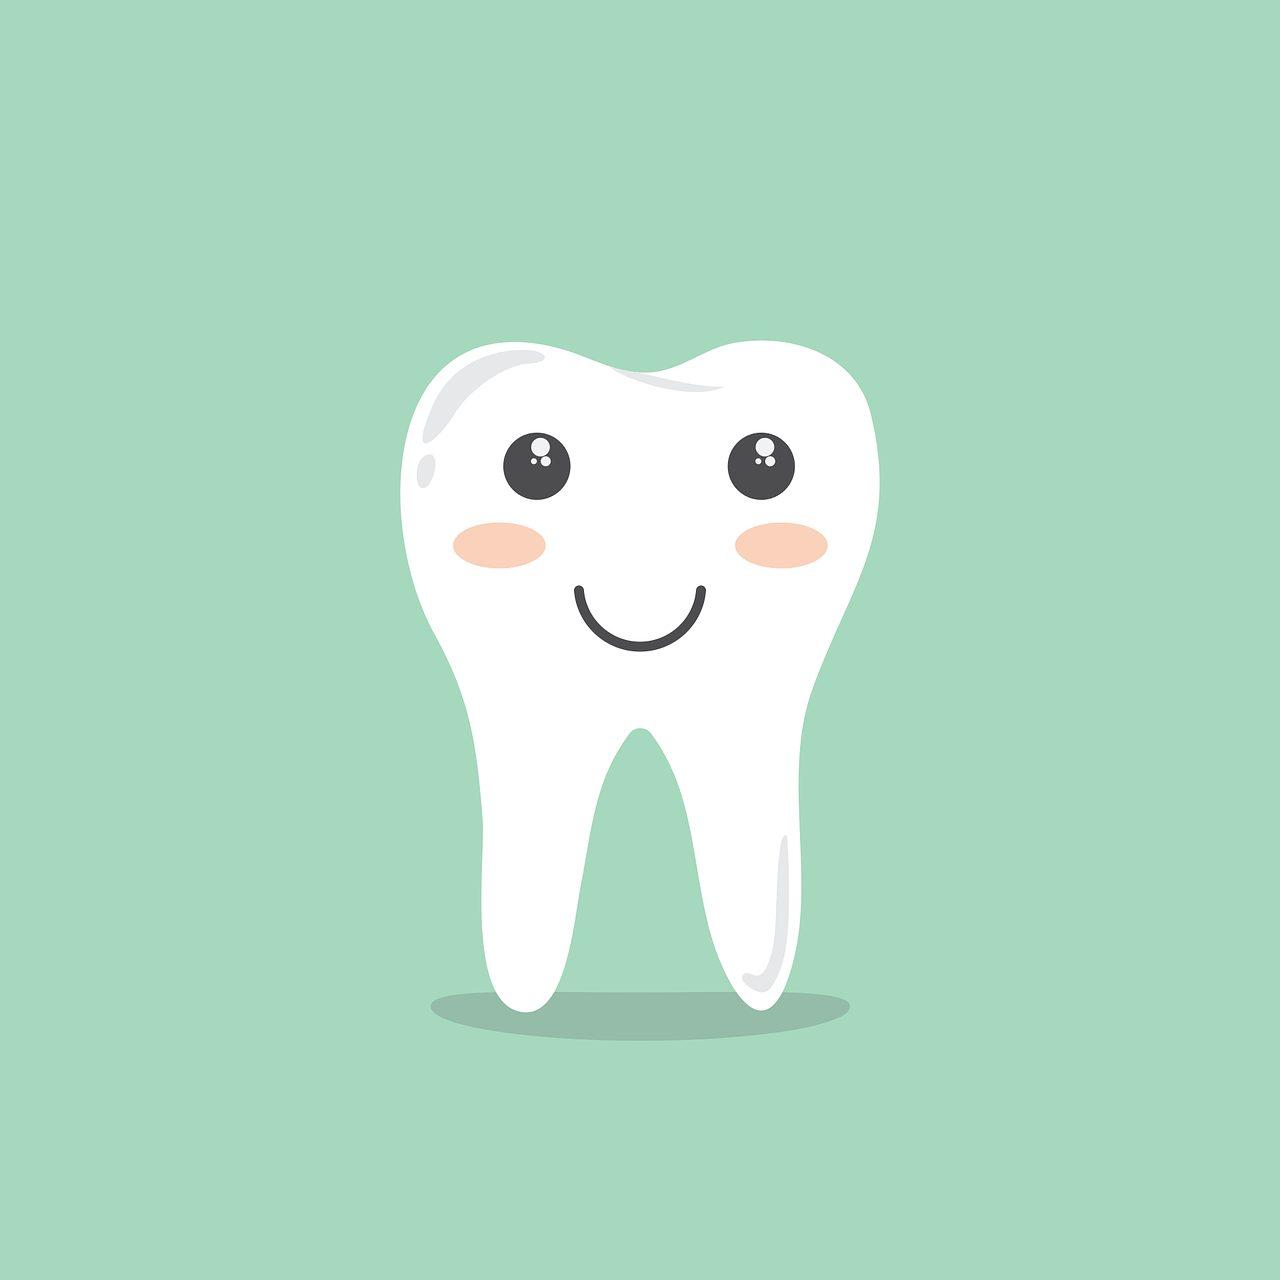 Snijders M tandarts